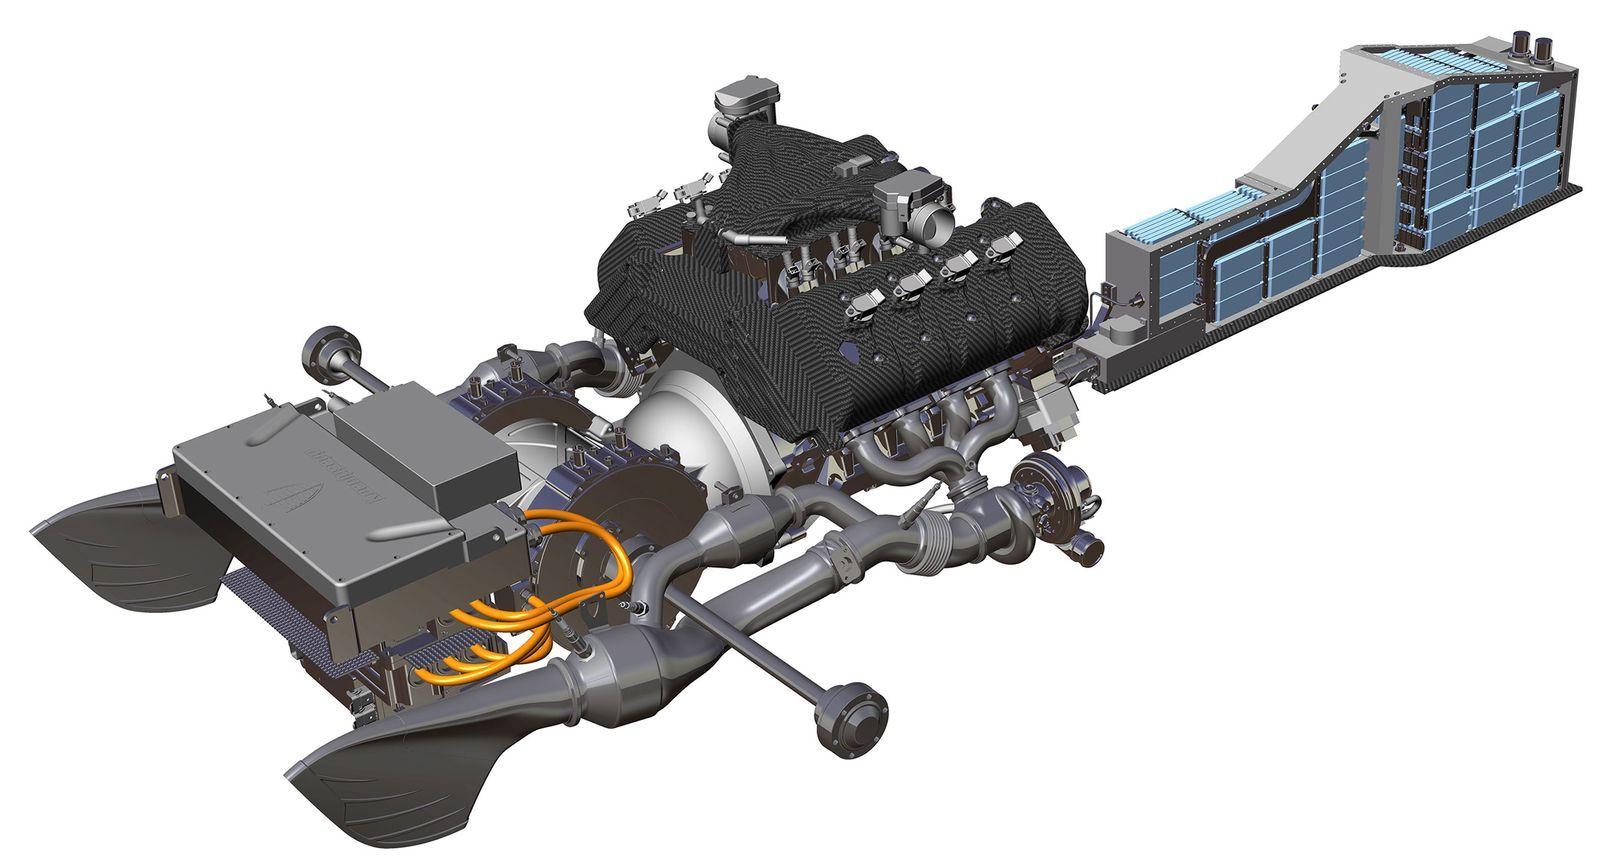 The Koenigsegg Regera has 1500 hp and no gearbox